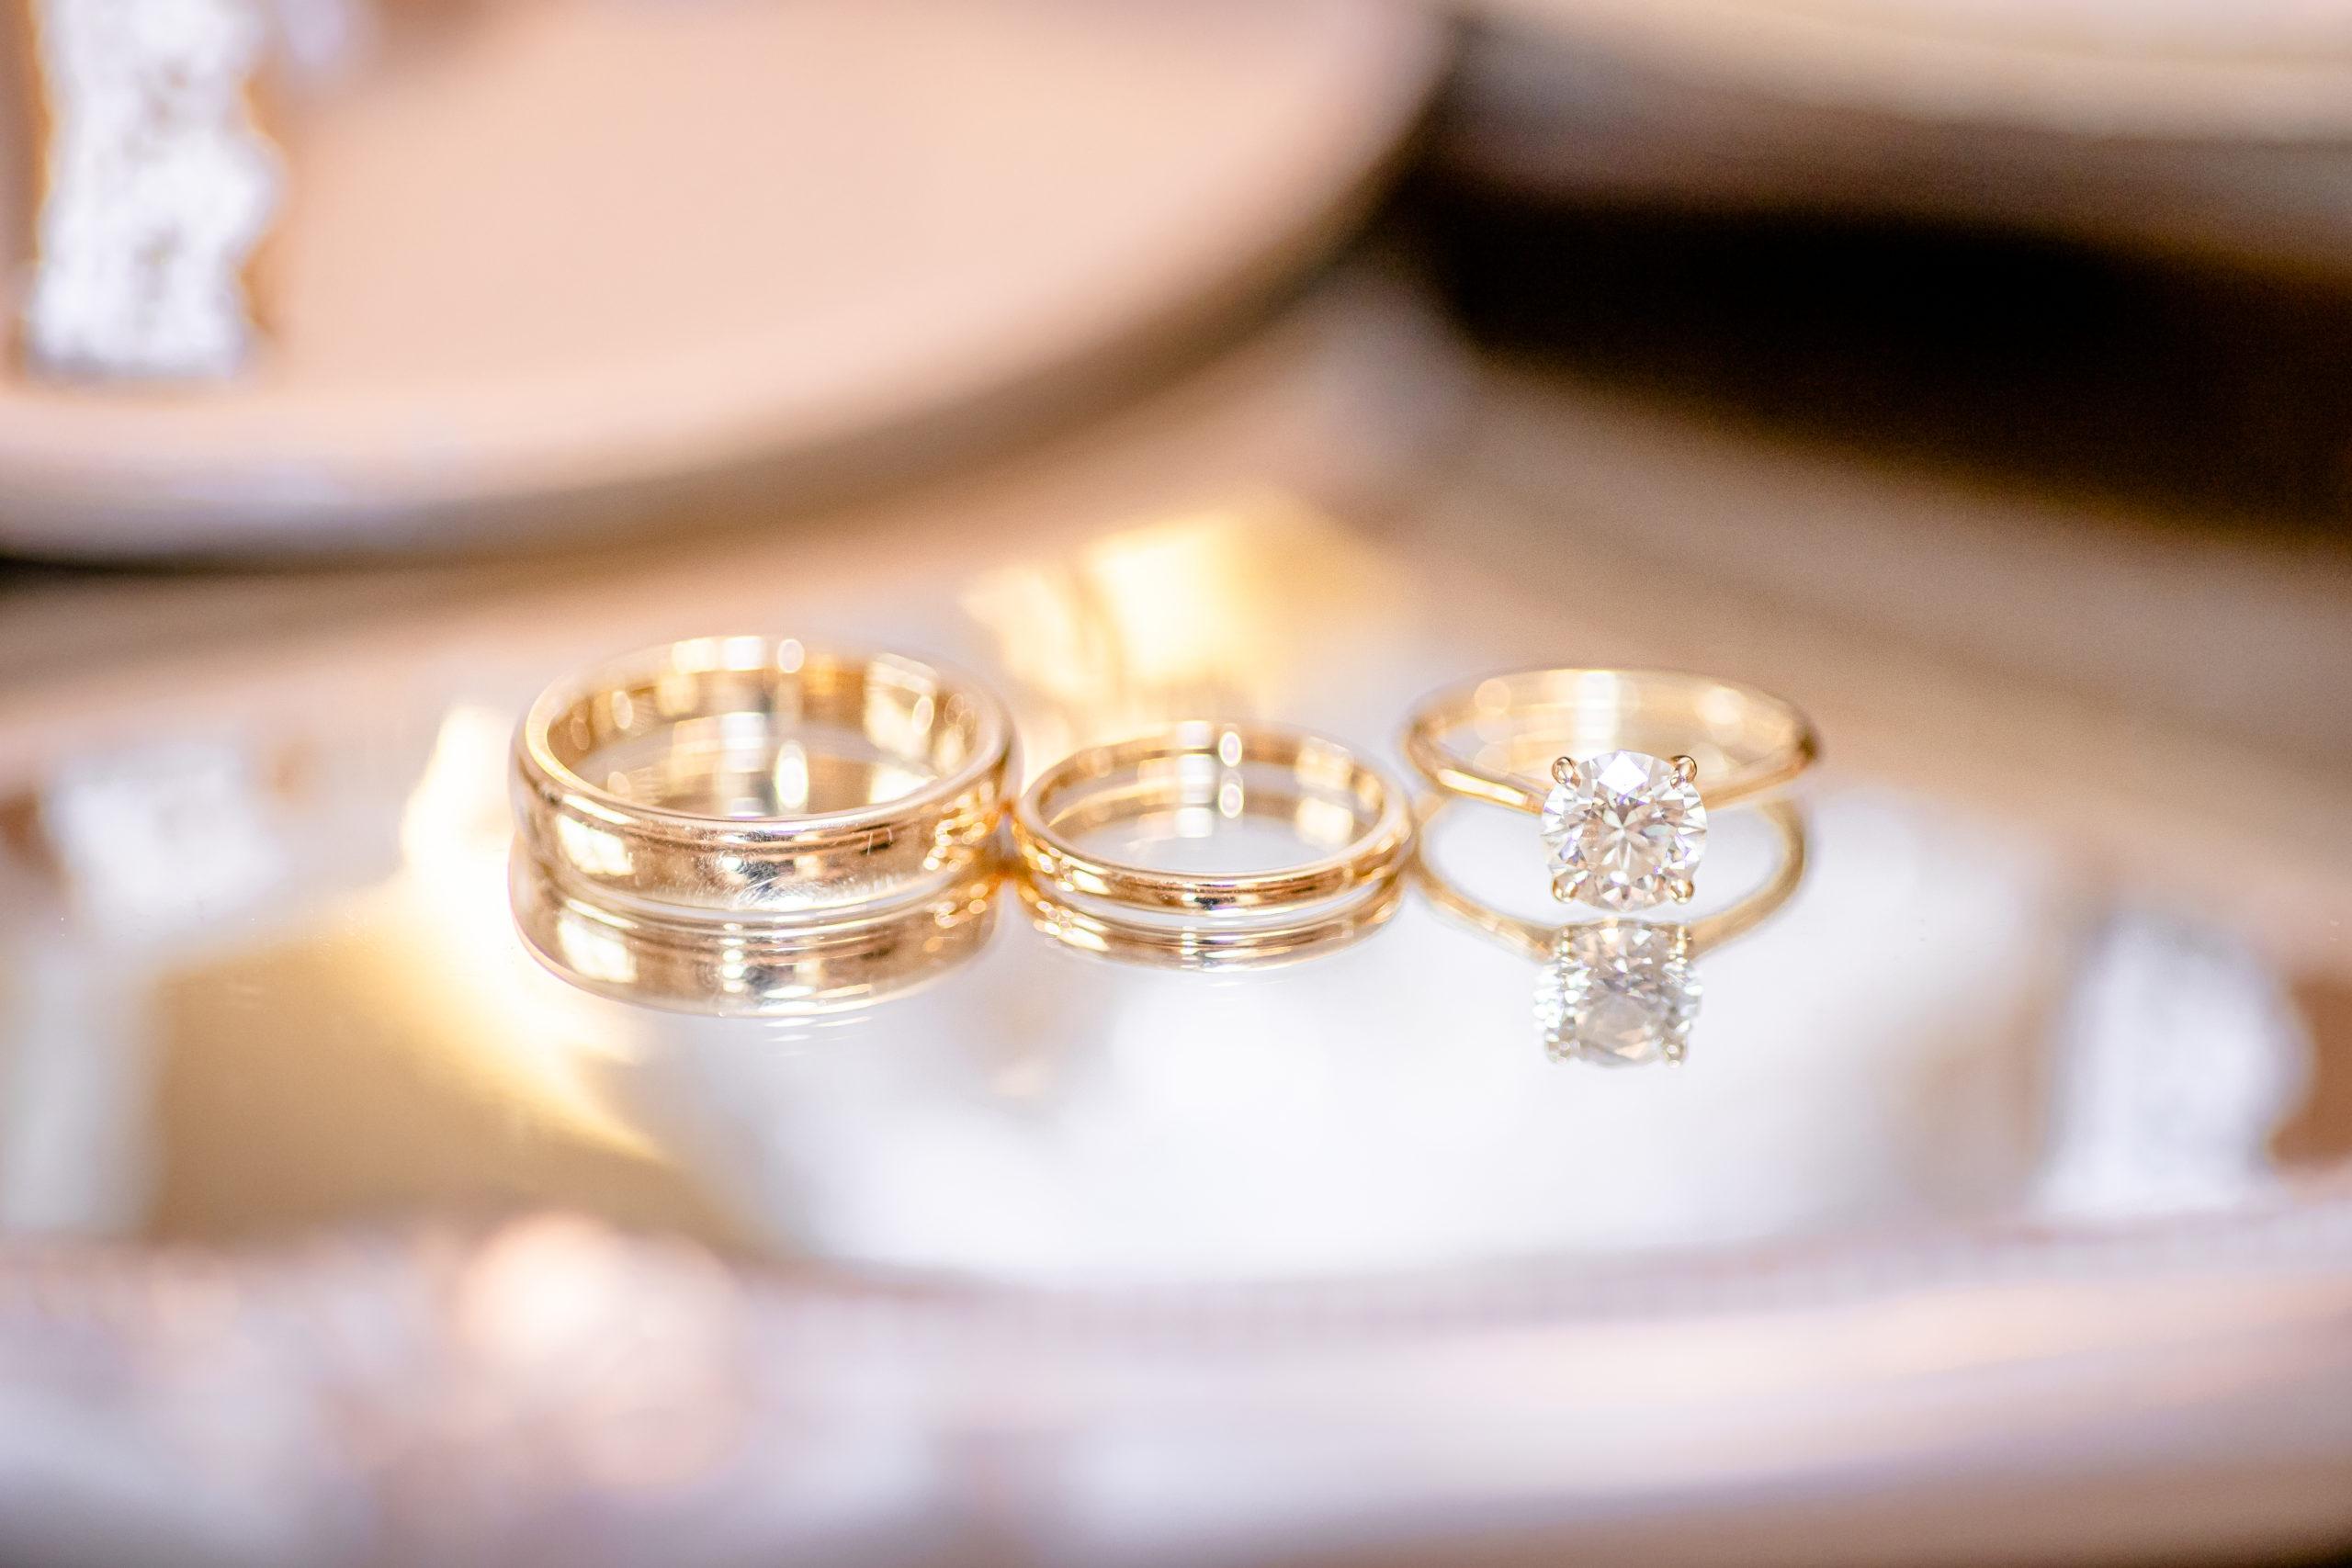 wedding photography, summer romance wedding, southern illinois wedding photography, wedding ring details, gold wedding bands, gold wedding rings